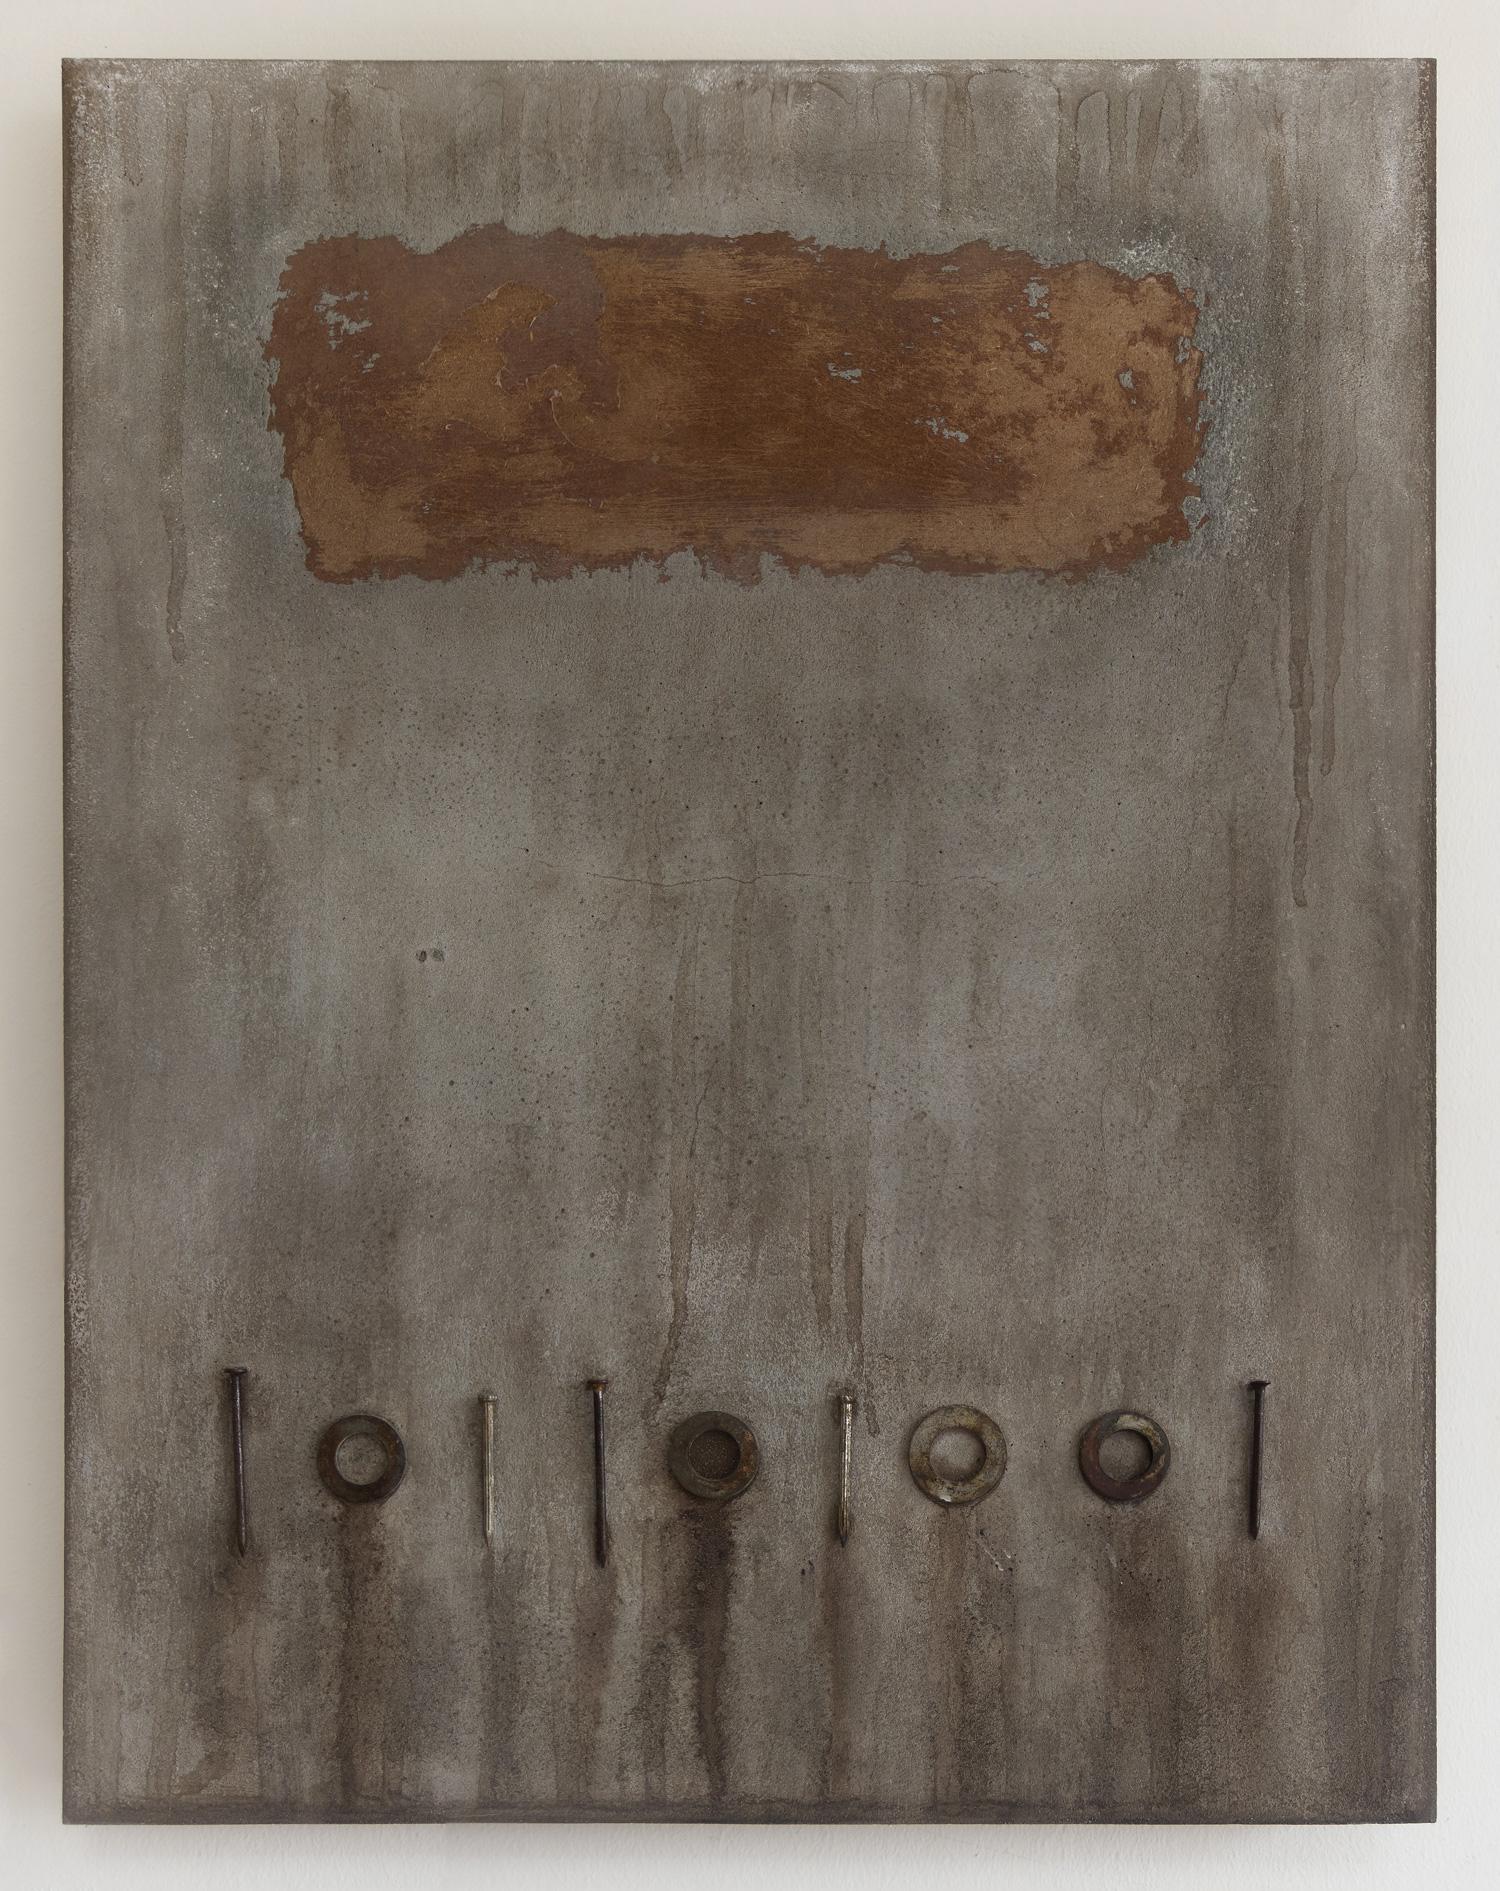 Untitled (101101001)